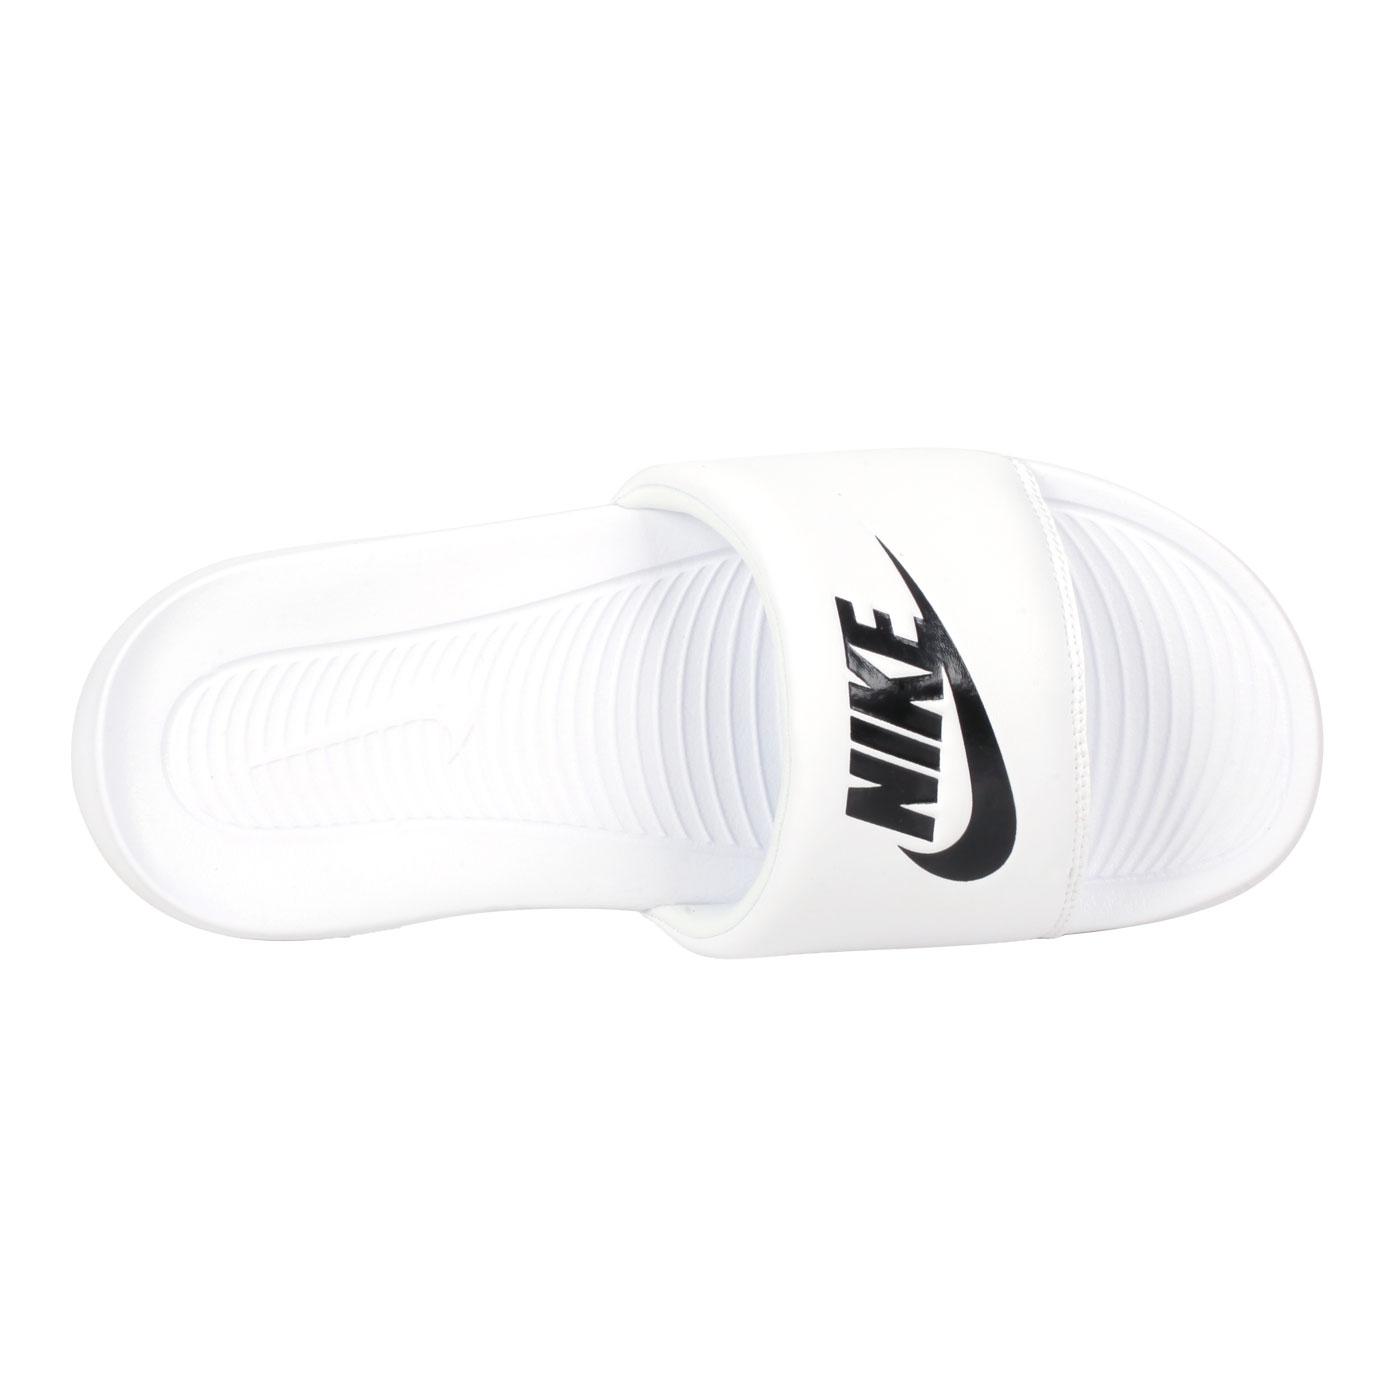 NIKE 女款休閒拖鞋  @W VICTORI ONE SLIDE@CN9677100 - 白黑